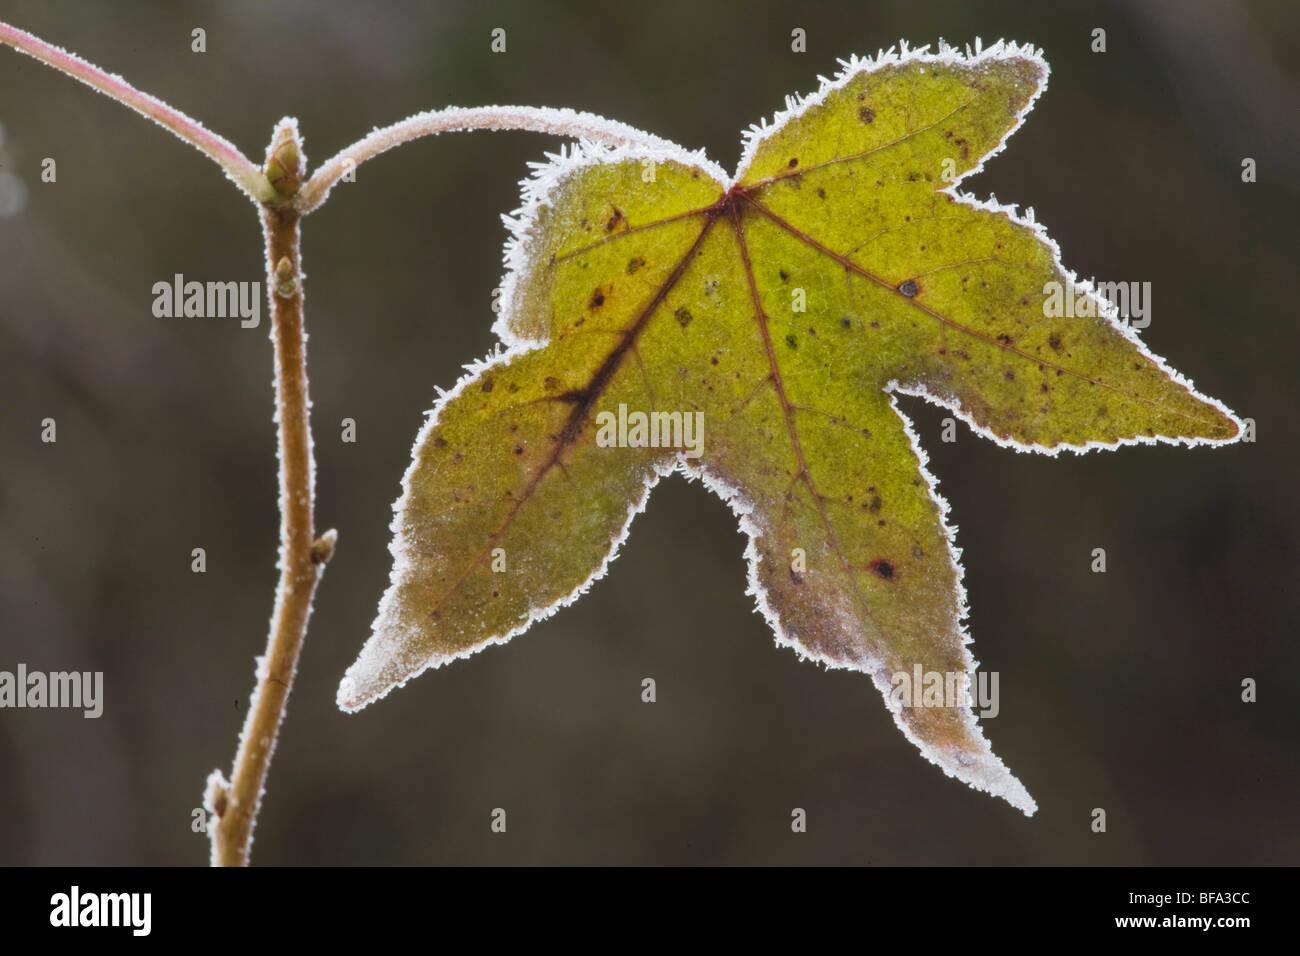 American Sweetgum (Liquidambar styraciflua), leaf frost covered, Lillington, North Carolina, USA - Stock Image